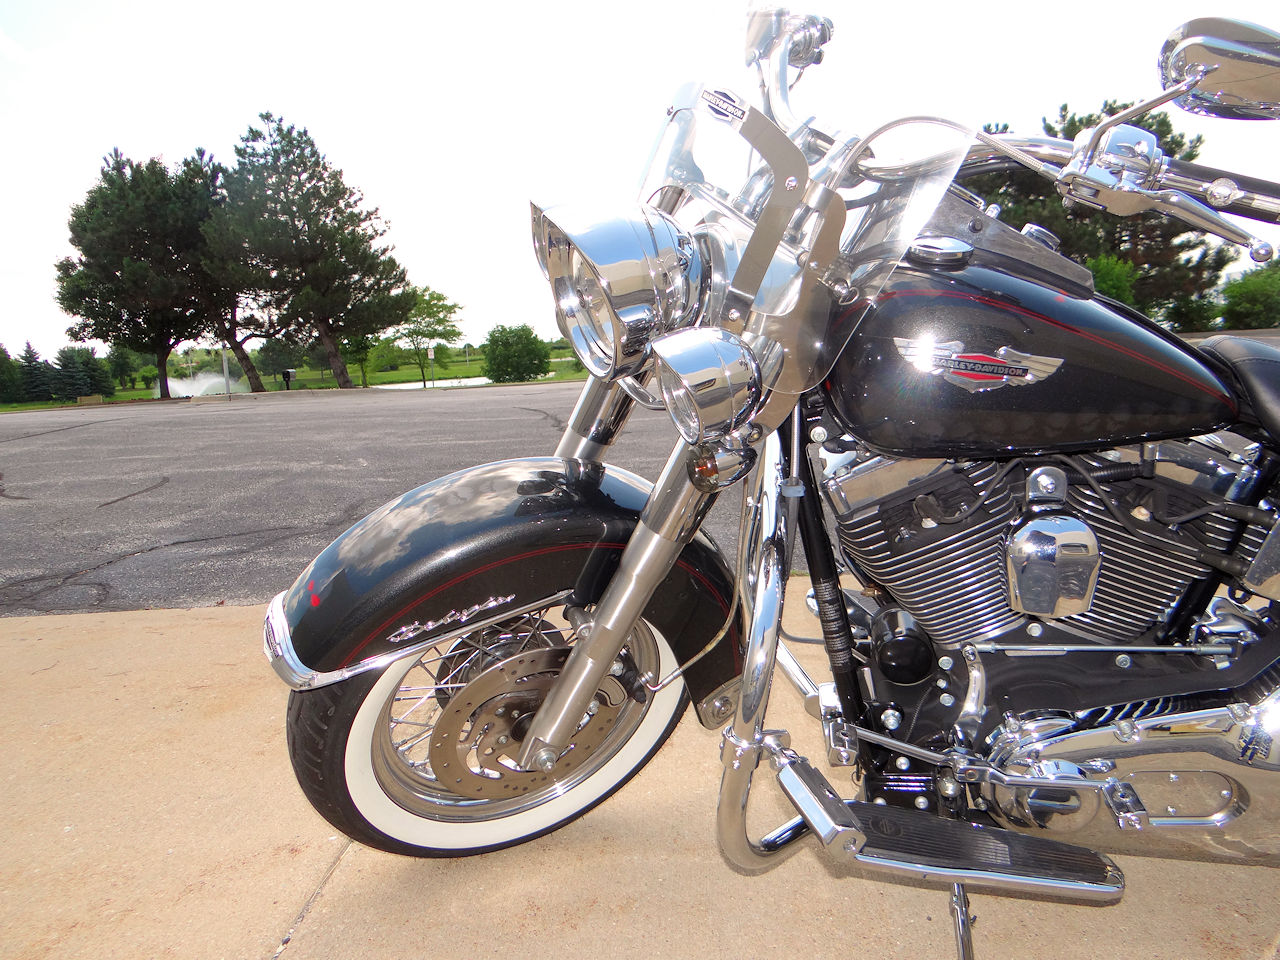 2006 Harley Davidson FLSTNI 18